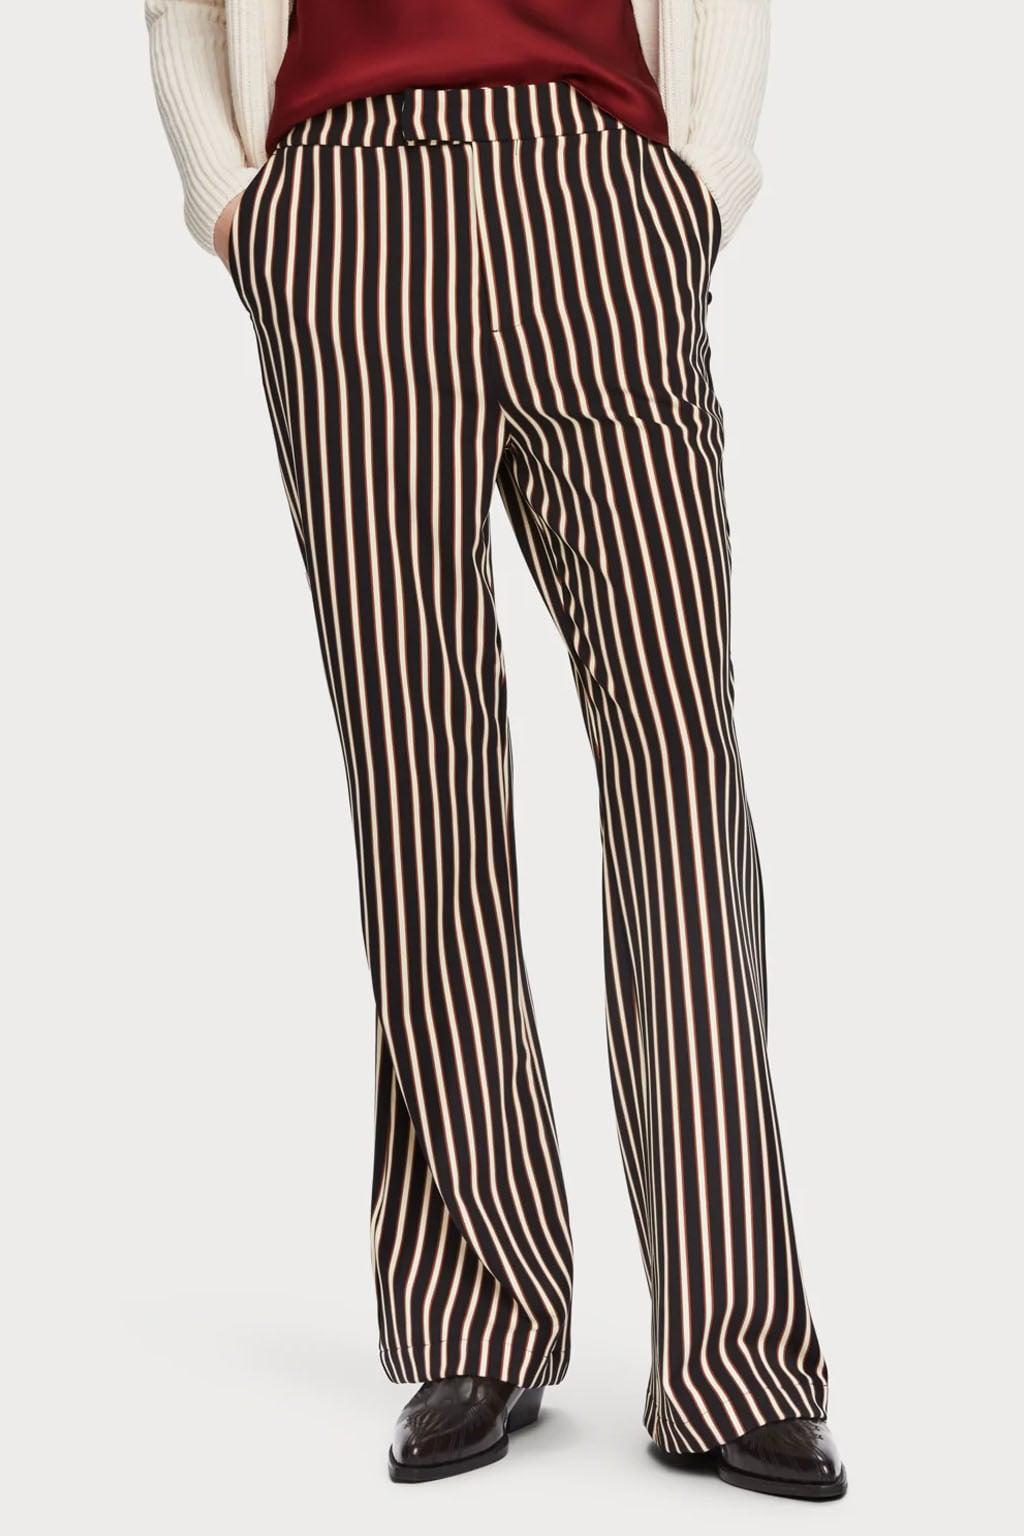 Wonderlijk Maison scotch gestreepte flare broek zwart/wit koop je   Kellyjeans.nl MC-45